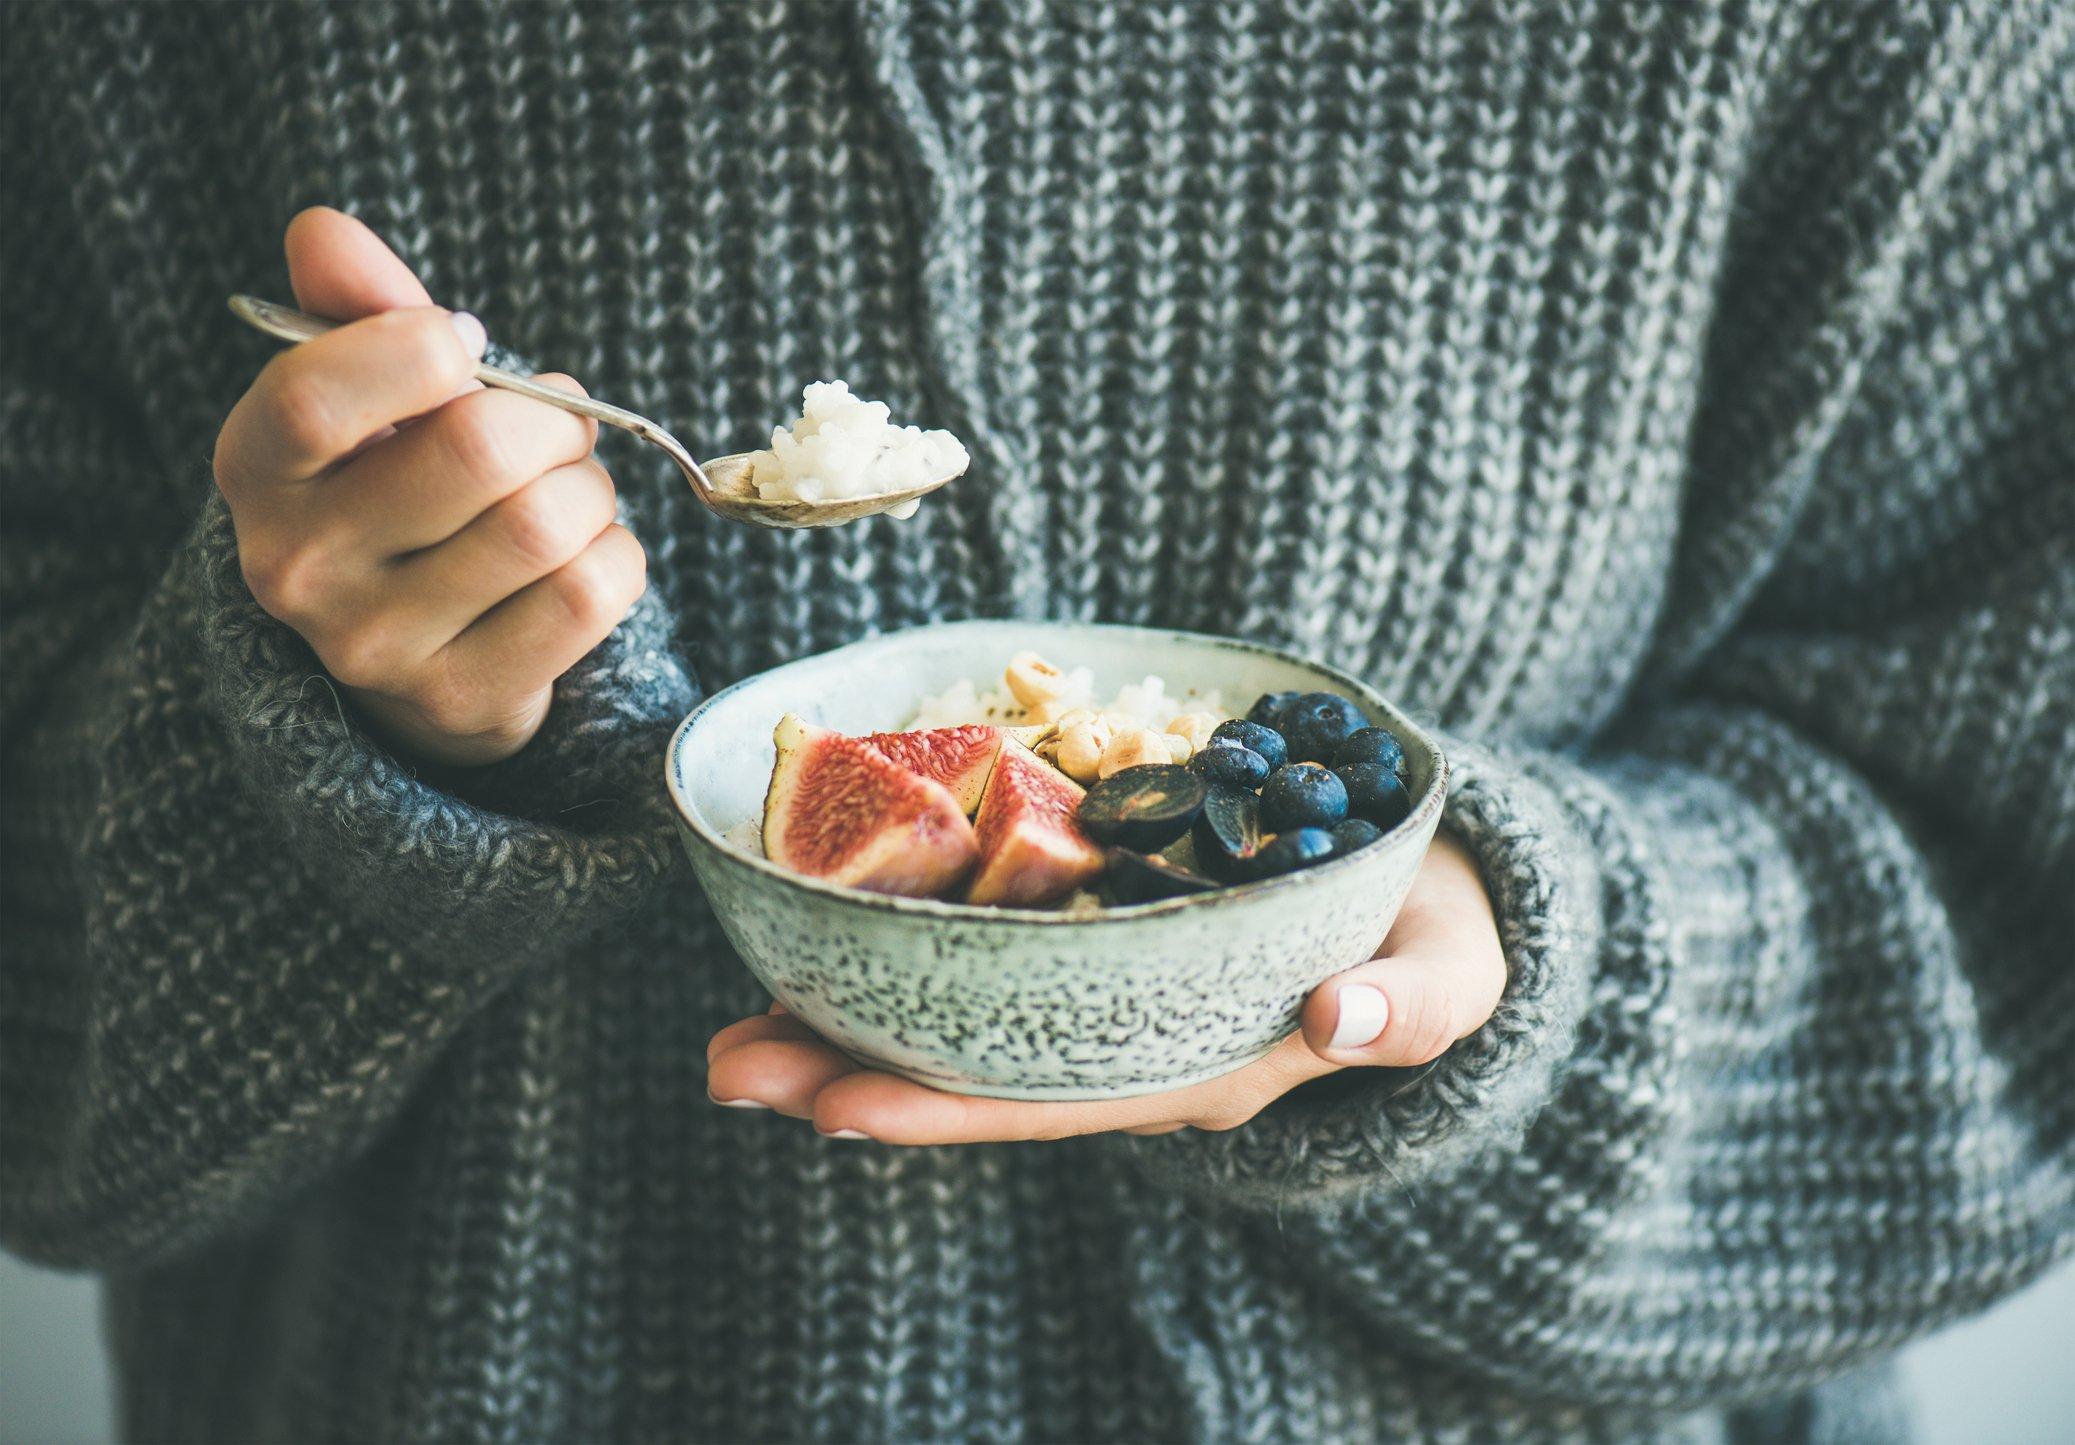 Healthy winter breakfast. Woman in woolen sweater eating rice coconut porridge with figs, berries, hazelnuts. Clean eating, vegetarian, vegan, alkiline diet food concept